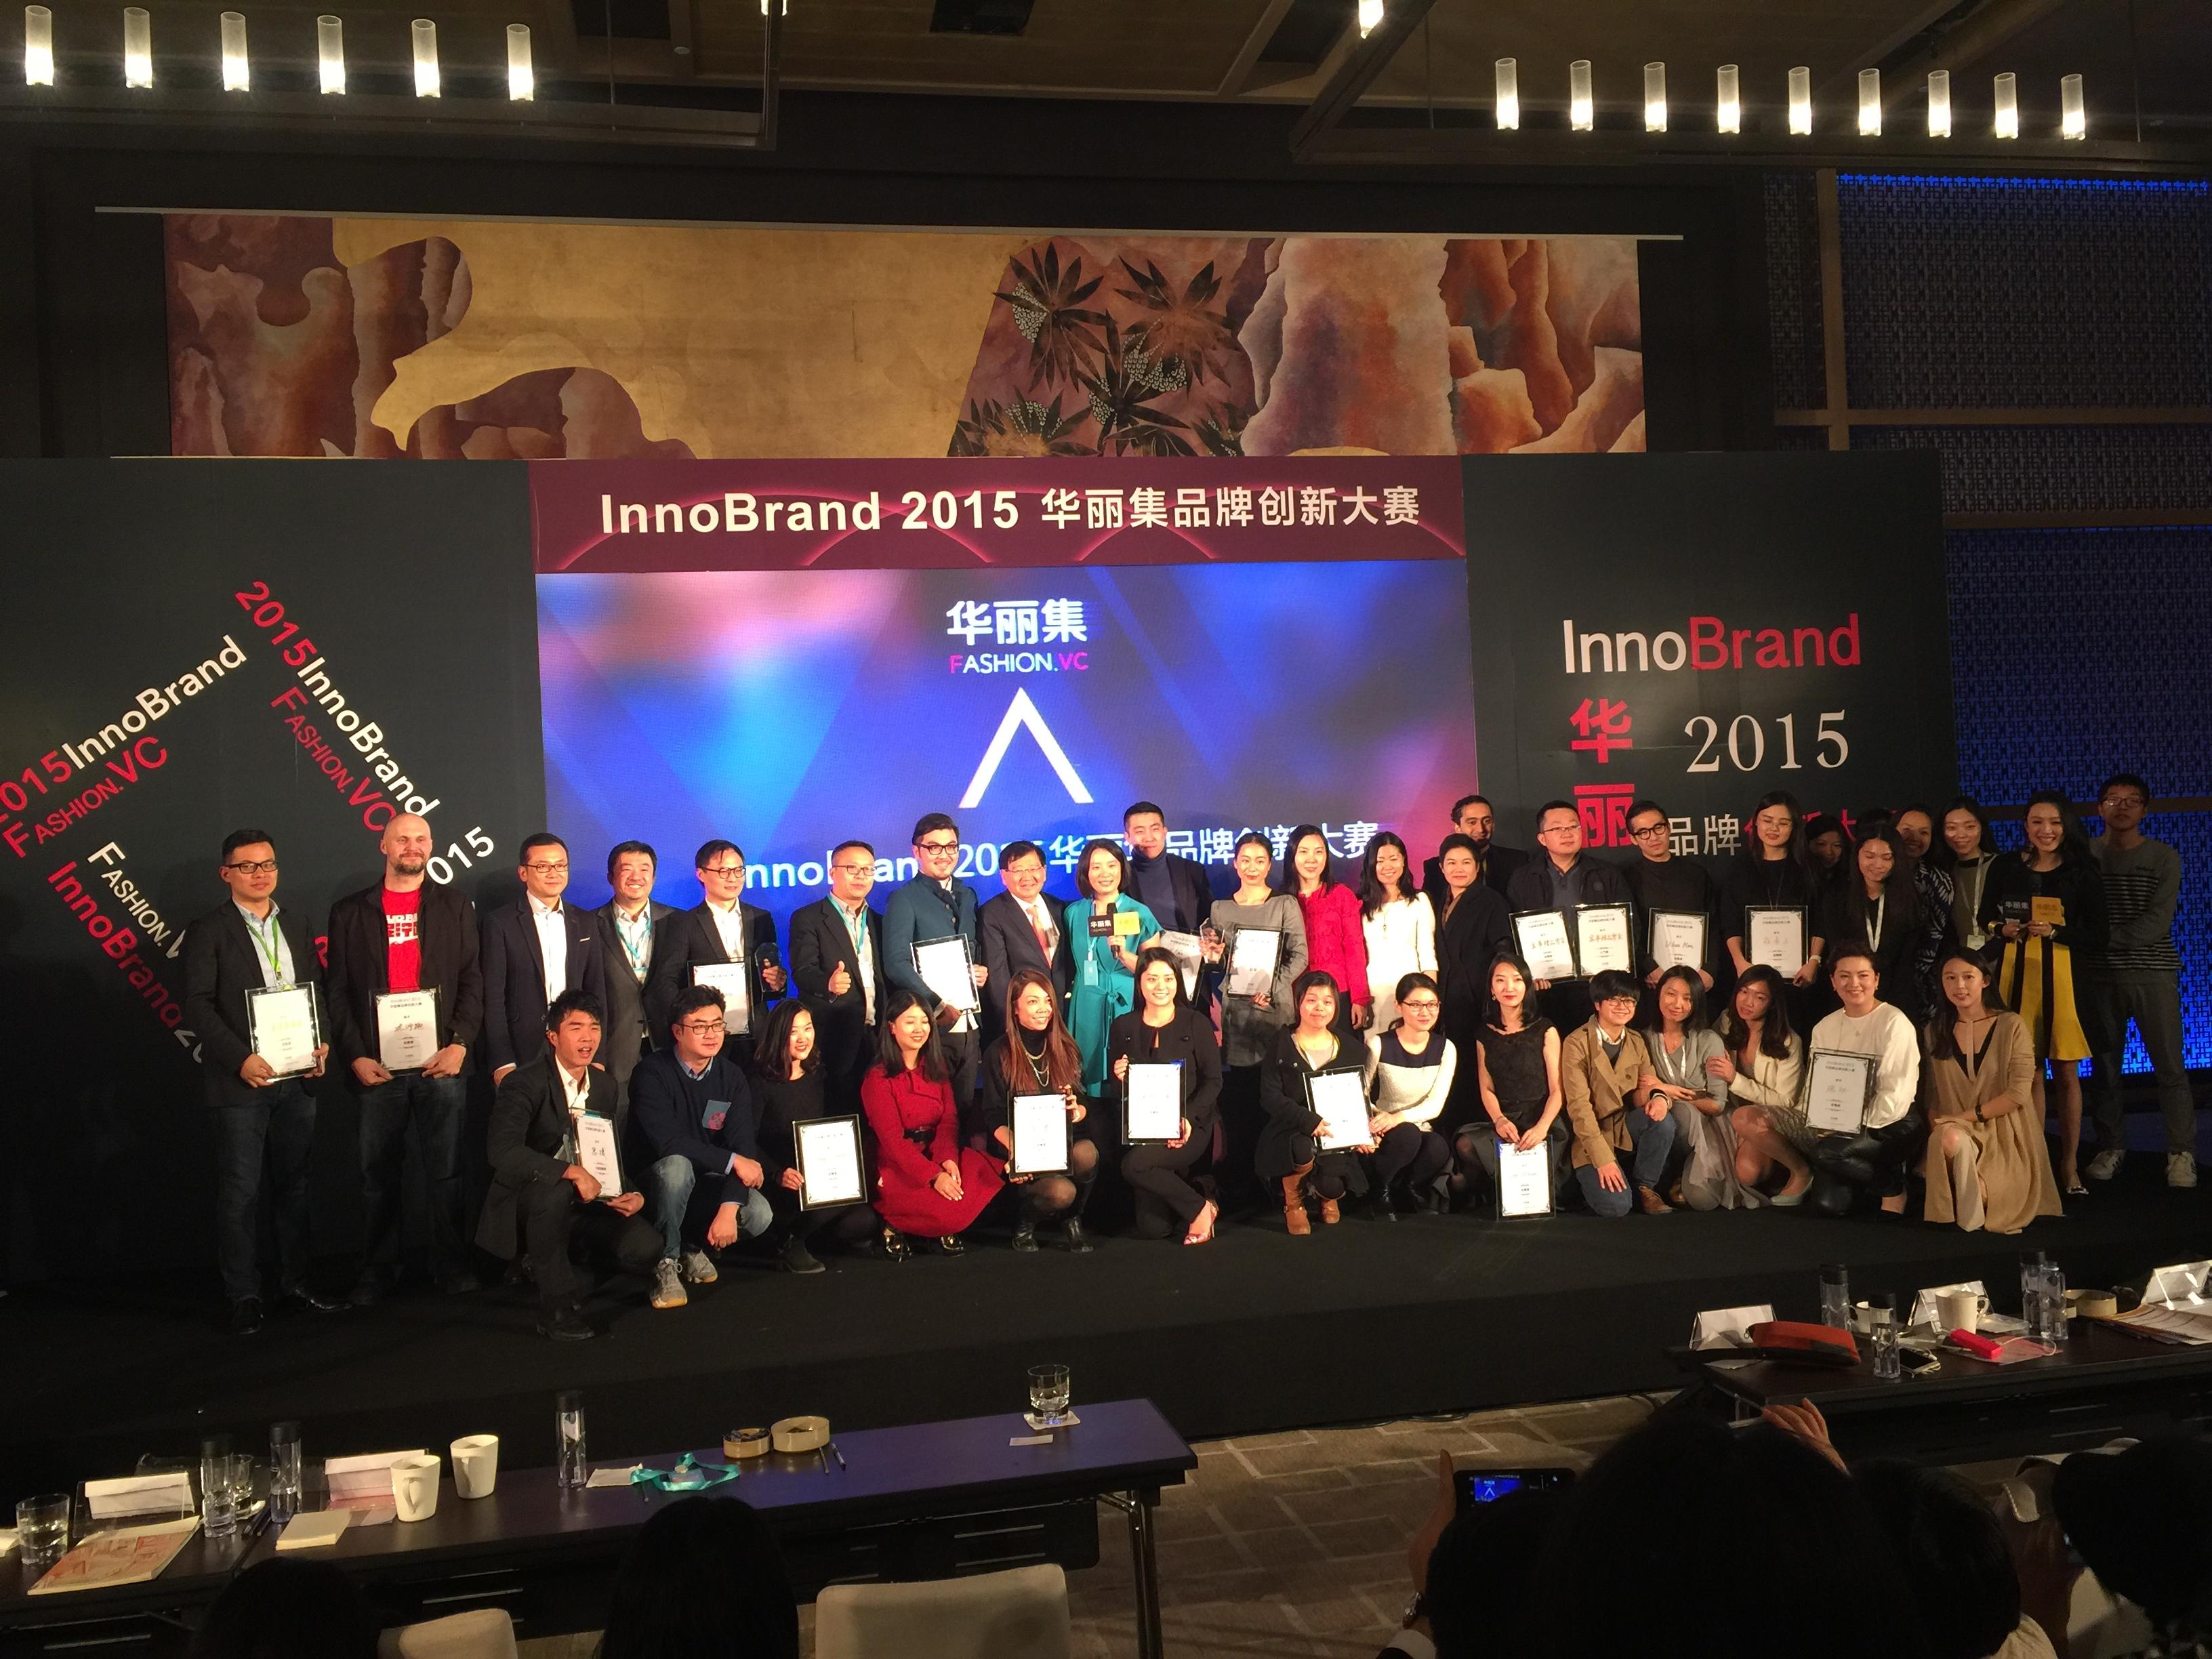 InnoBrand 2015 华丽集品牌创新大赛 获奖名单通告